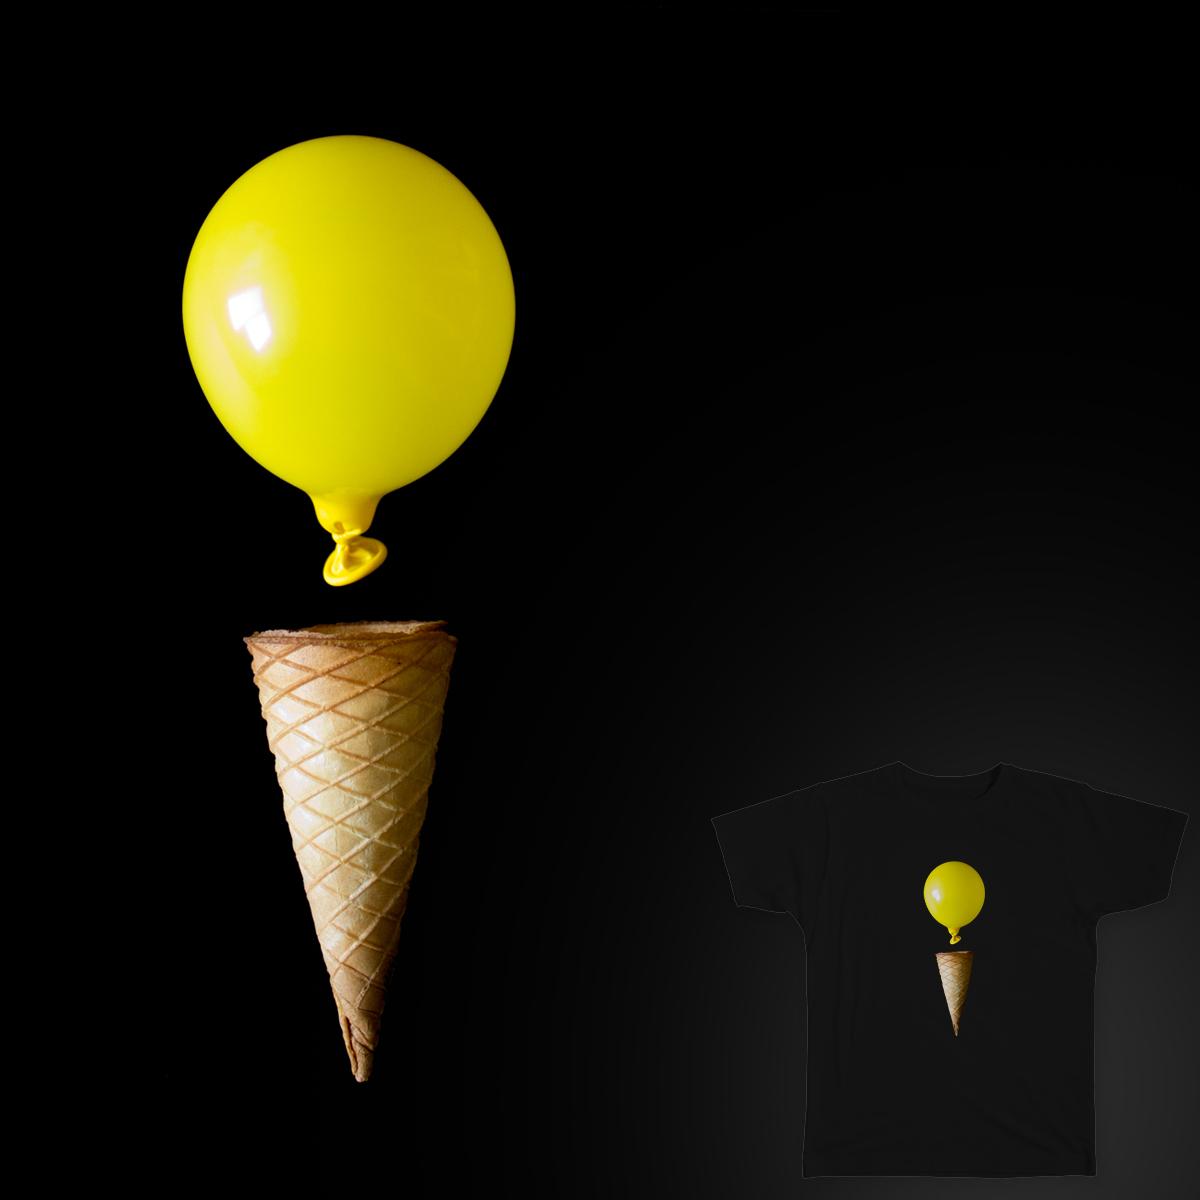 Balloon-Cream by cintascotch on Threadless